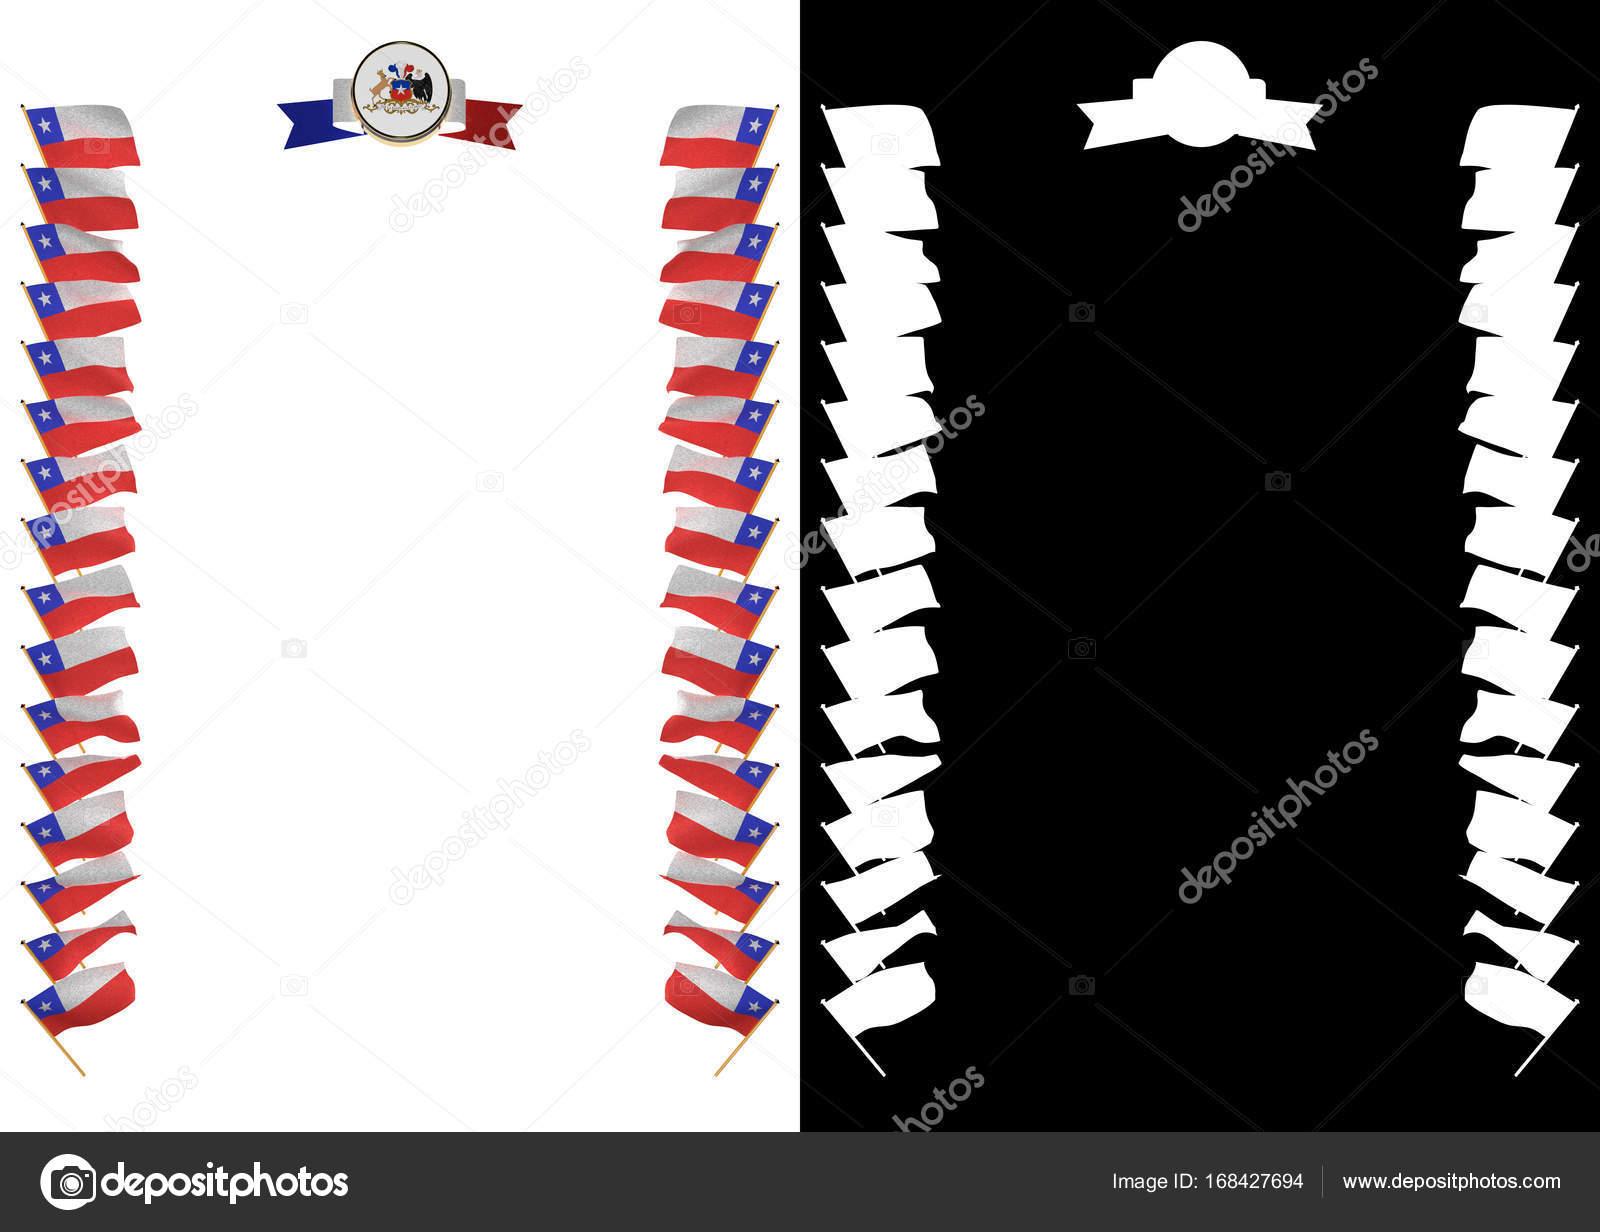 Großzügig Flag Rahmen Bilder - Rahmen Ideen - markjohnsonshow.info